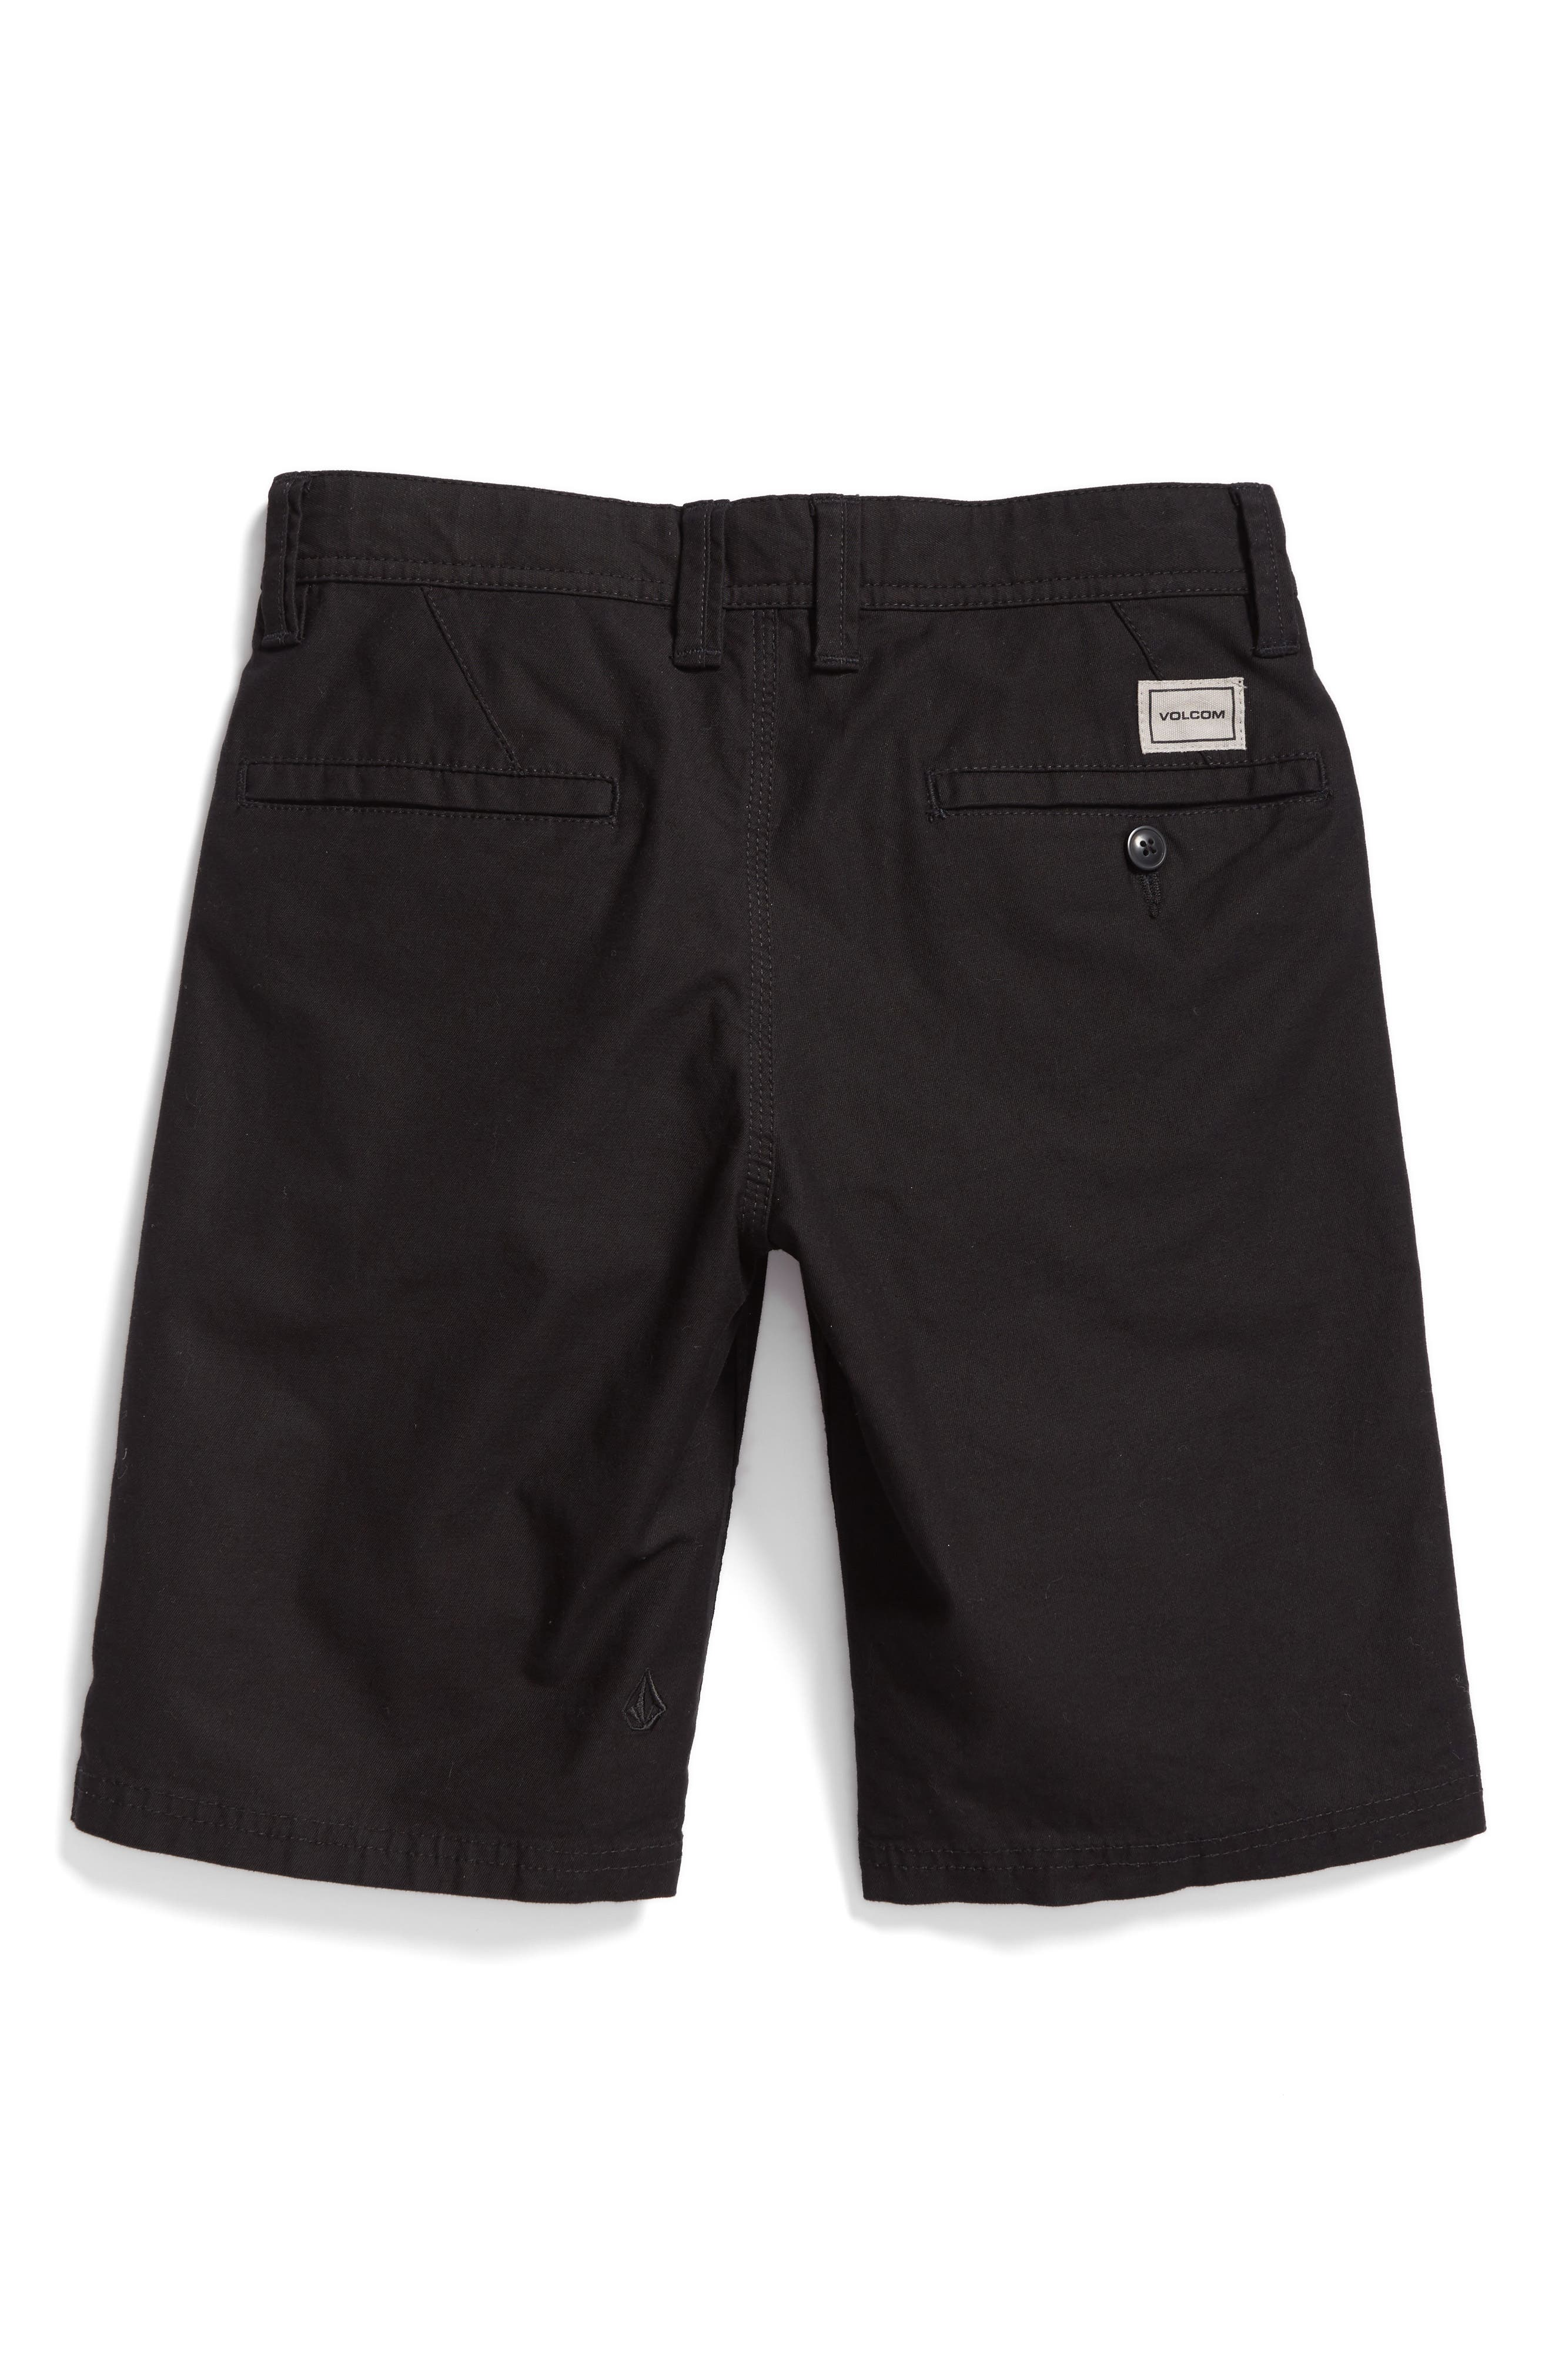 VSM Gritter Chino Shorts,                             Alternate thumbnail 3, color,